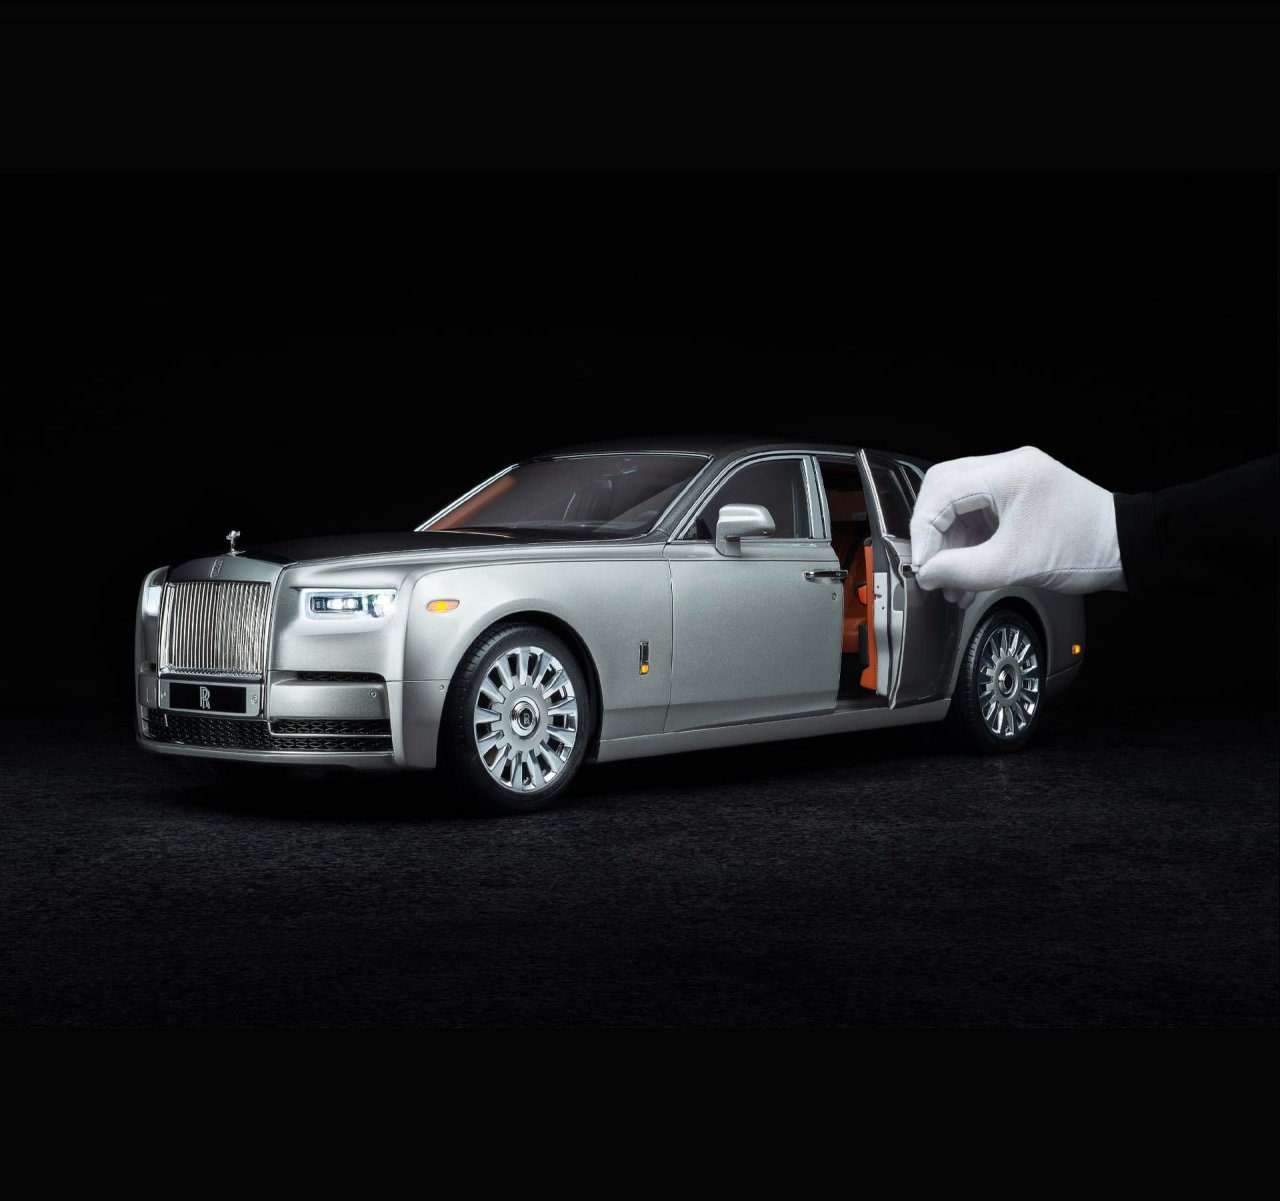 replica model cars